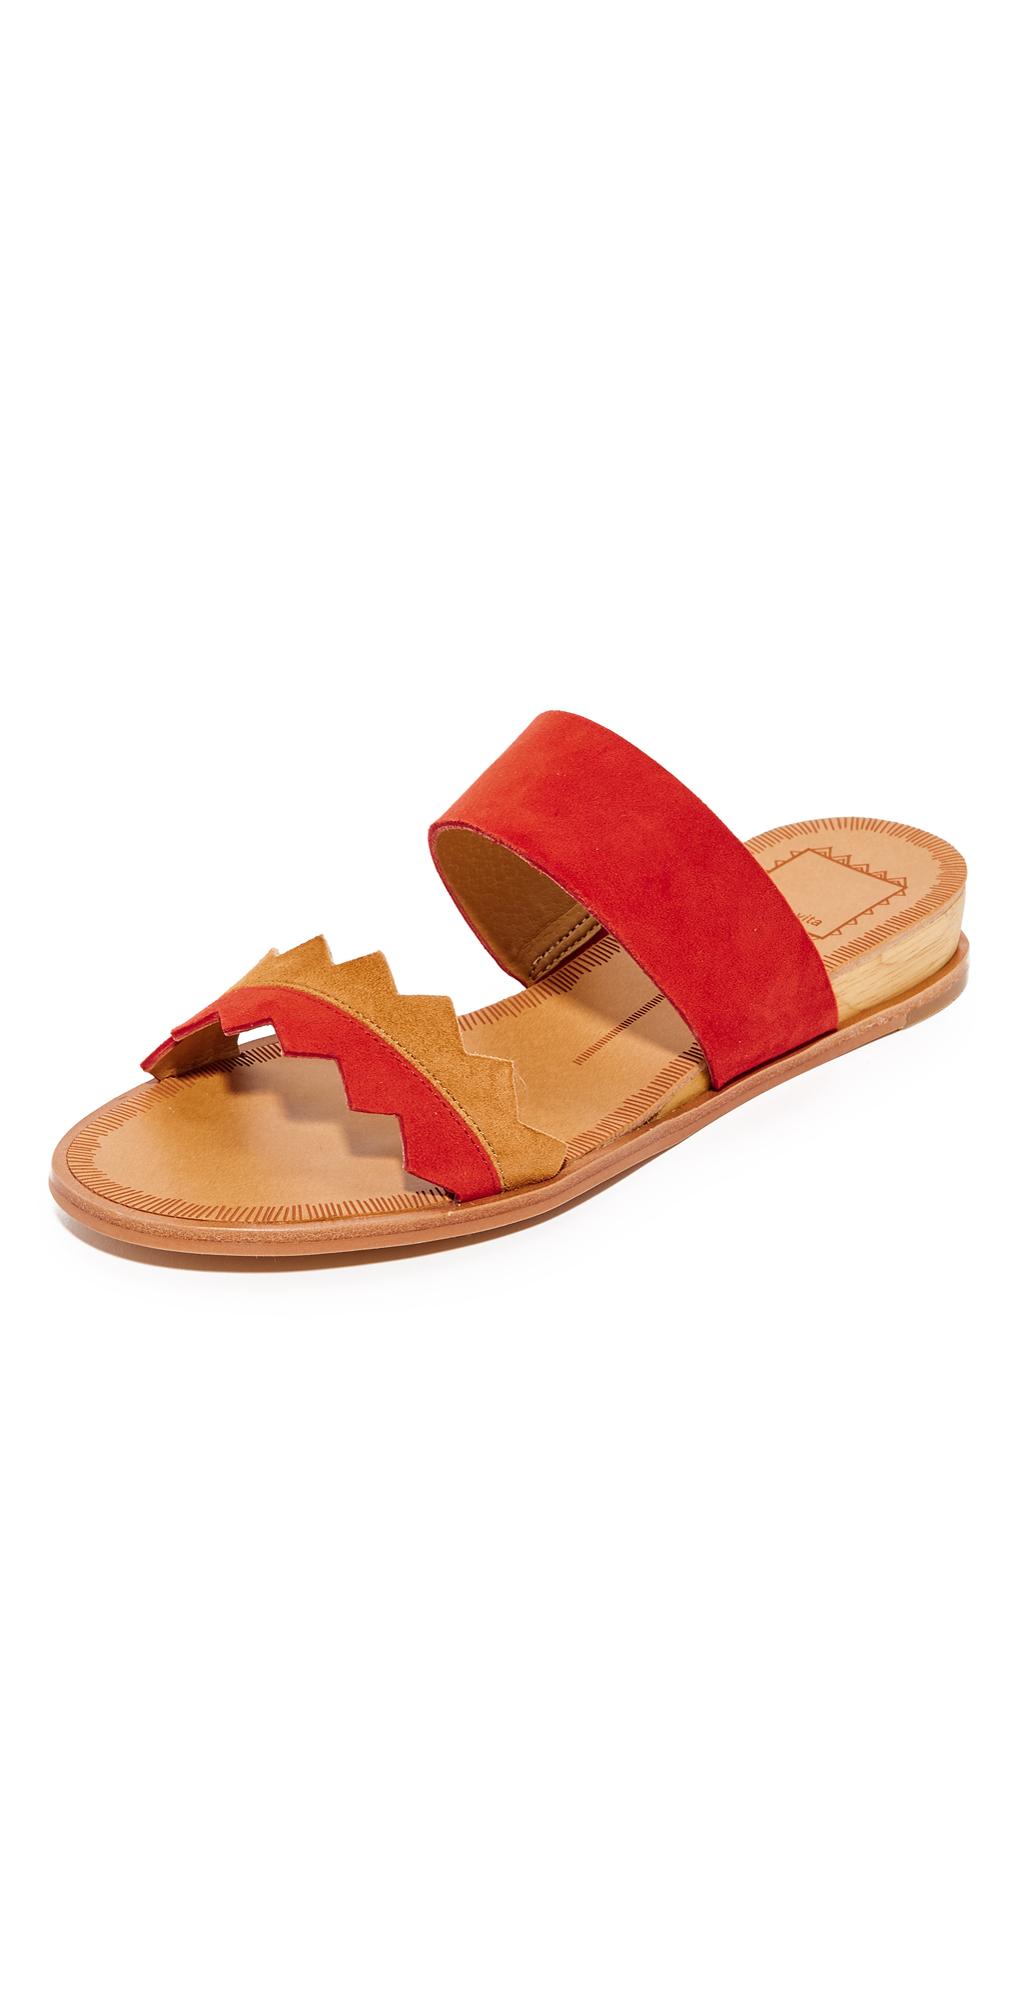 Pacer Sandals Dolce Vita